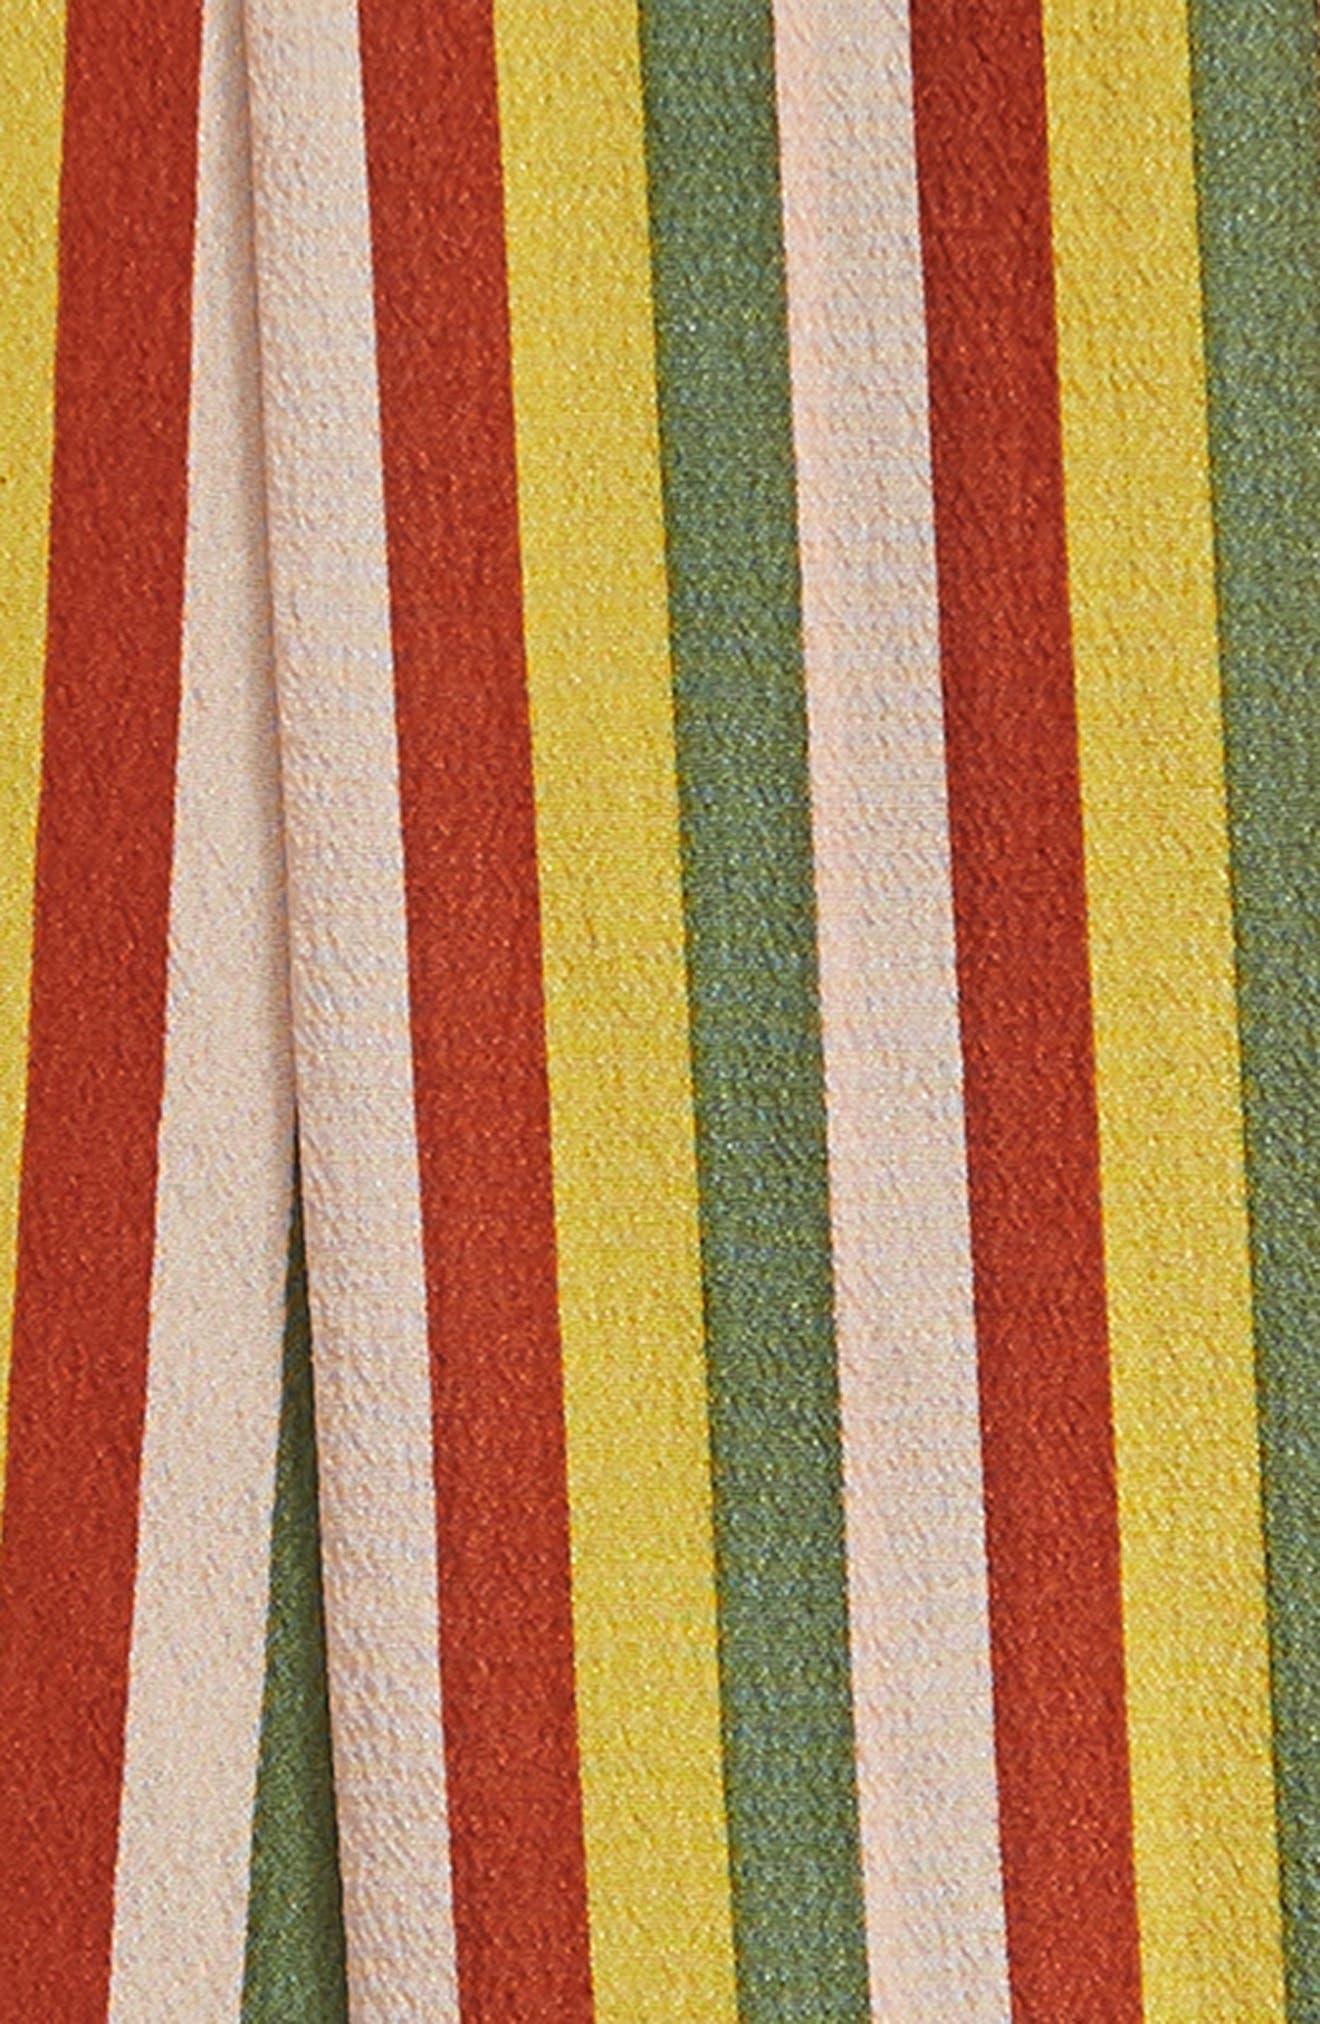 Silk Skinny Bandana,                             Alternate thumbnail 4, color,                             300